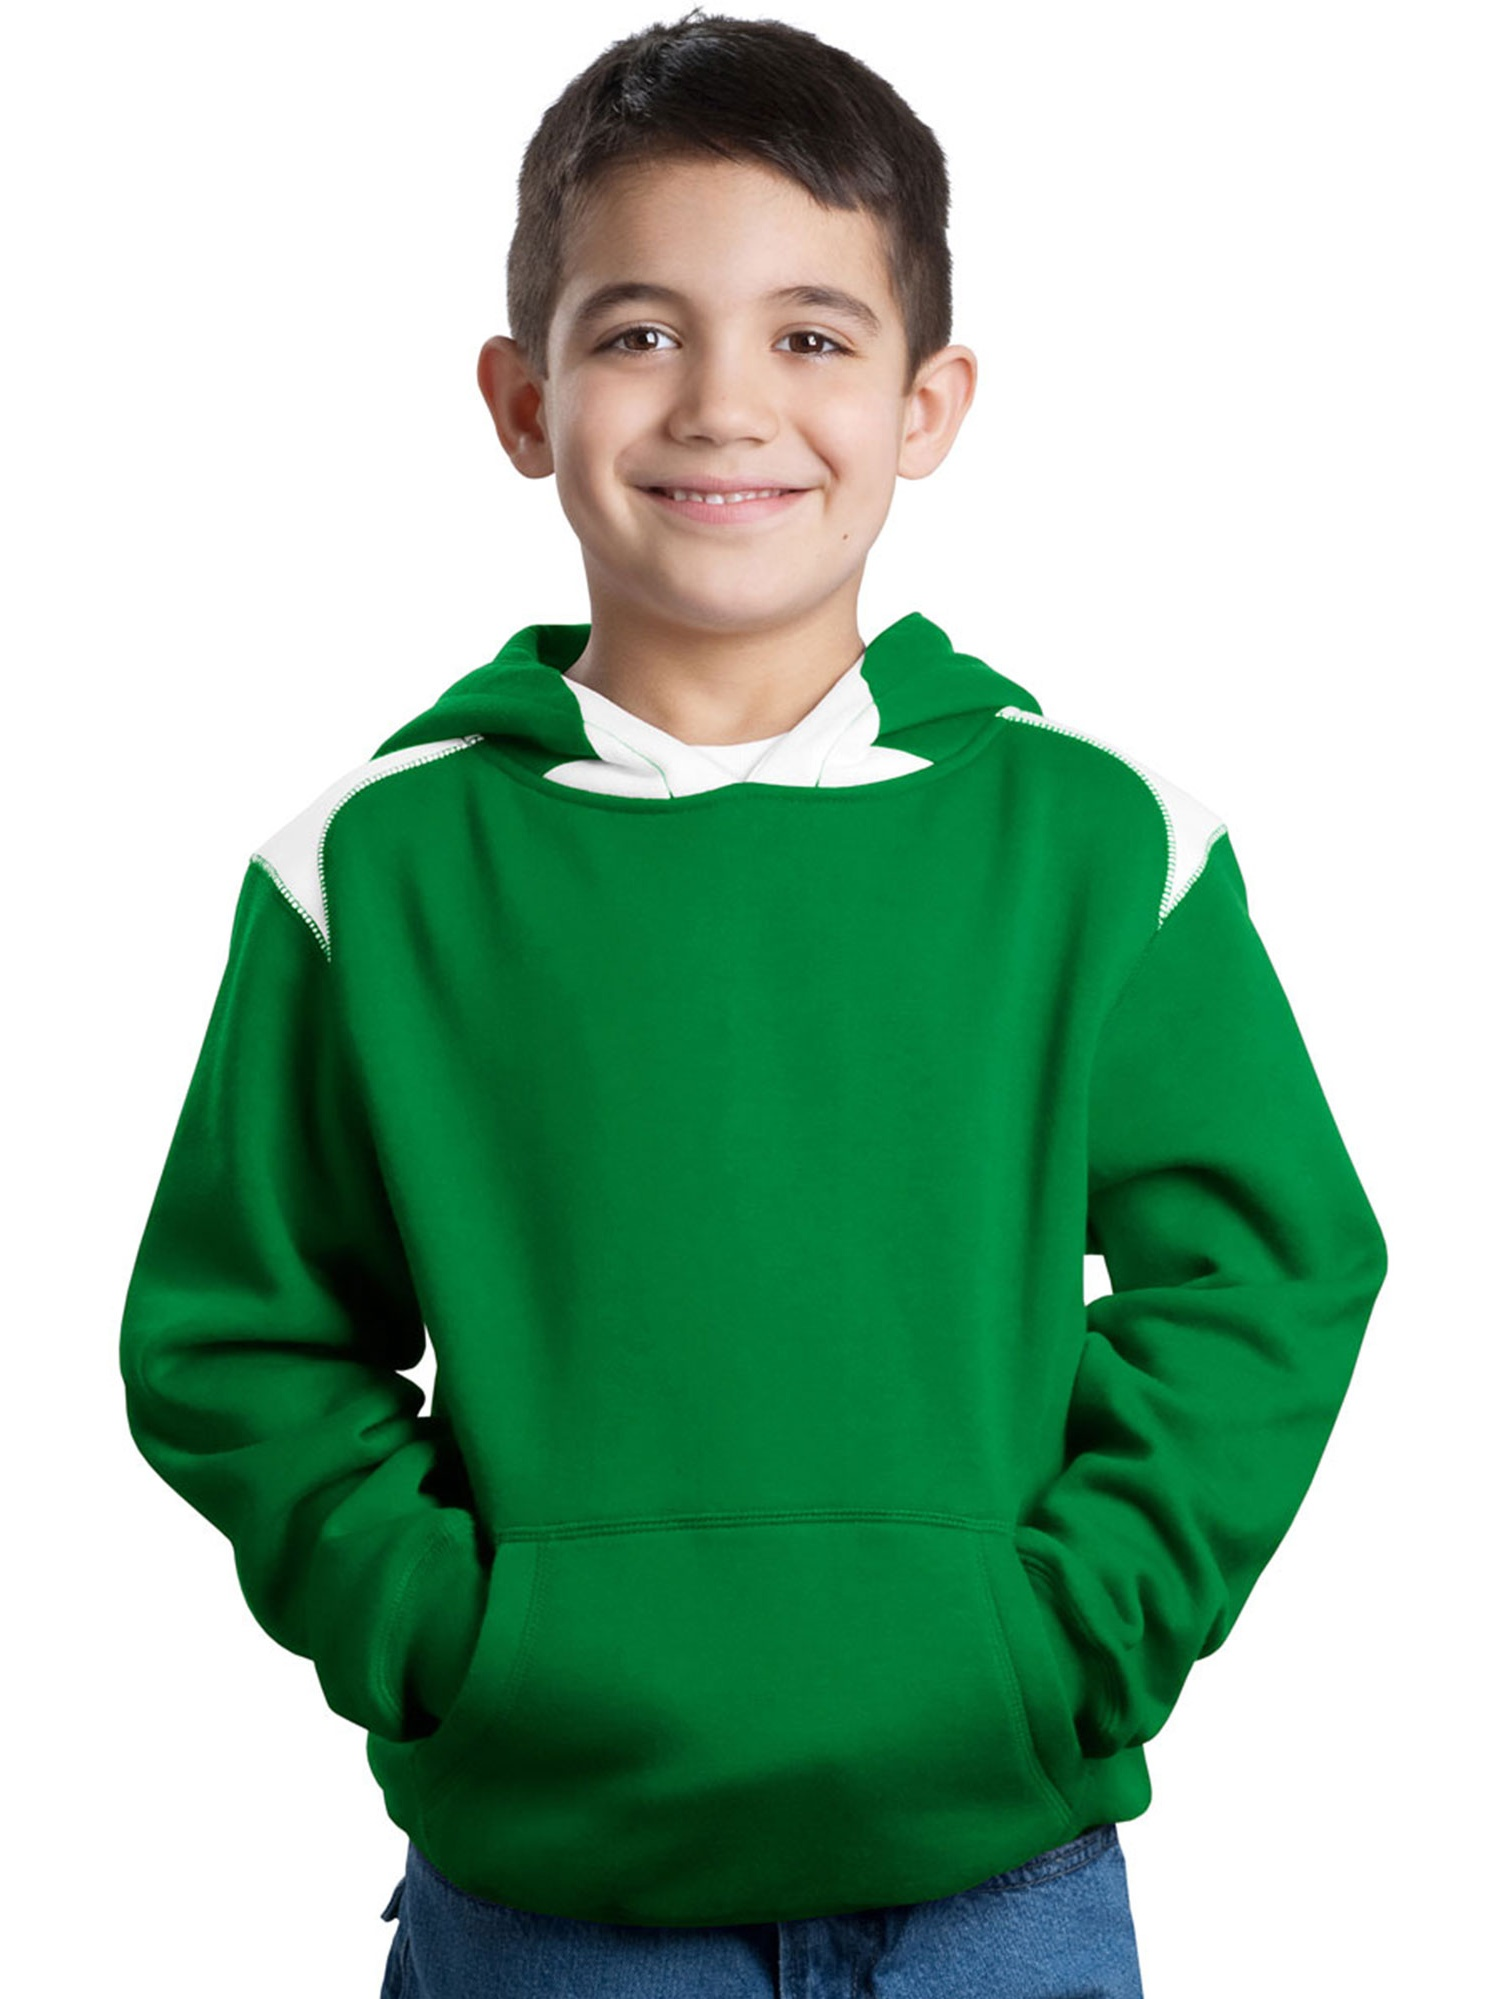 Sport-Tek Youth Contrast Color Pullover Hooded Sweatshirt